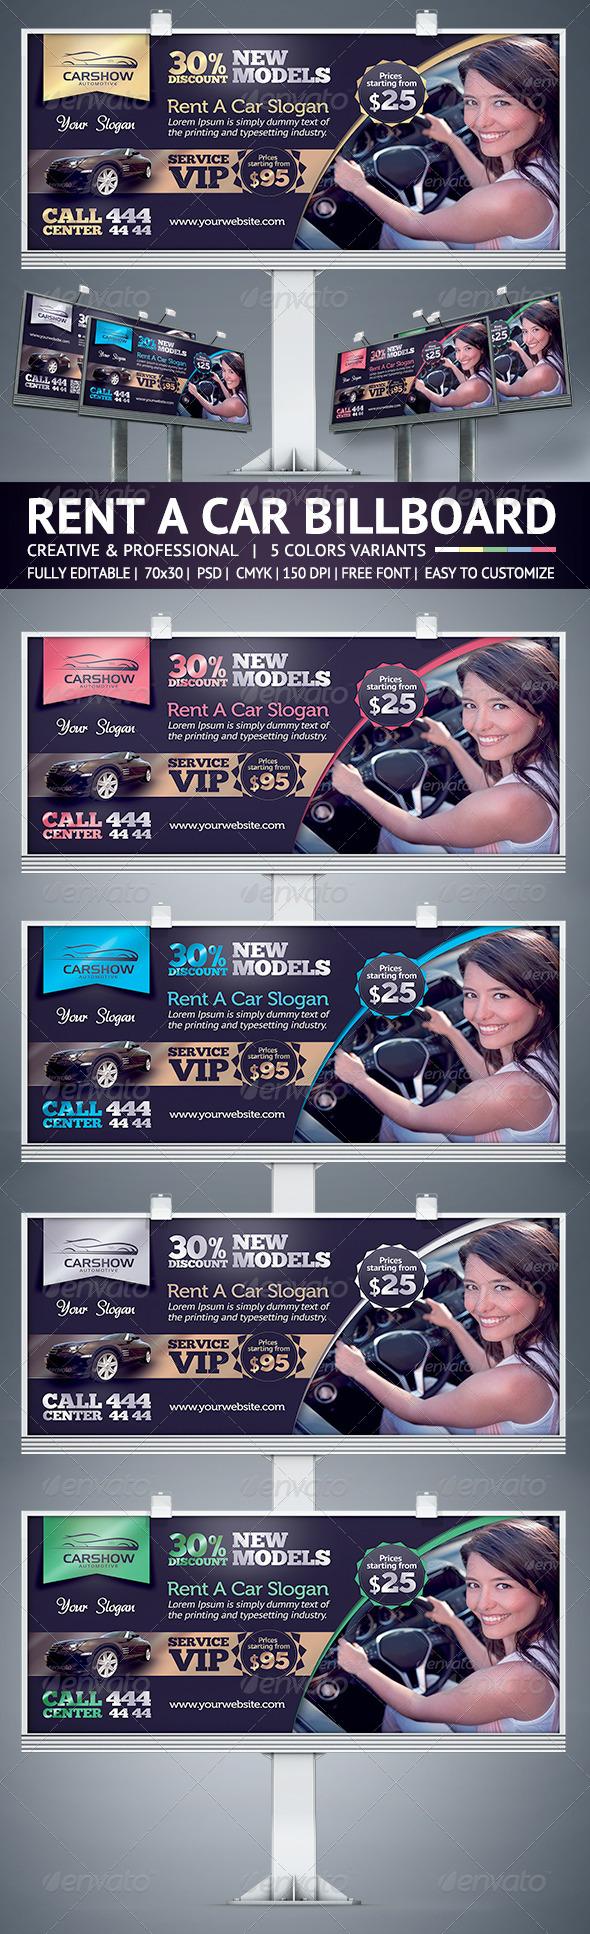 GraphicRiver Rent A Car Billboard 6139515